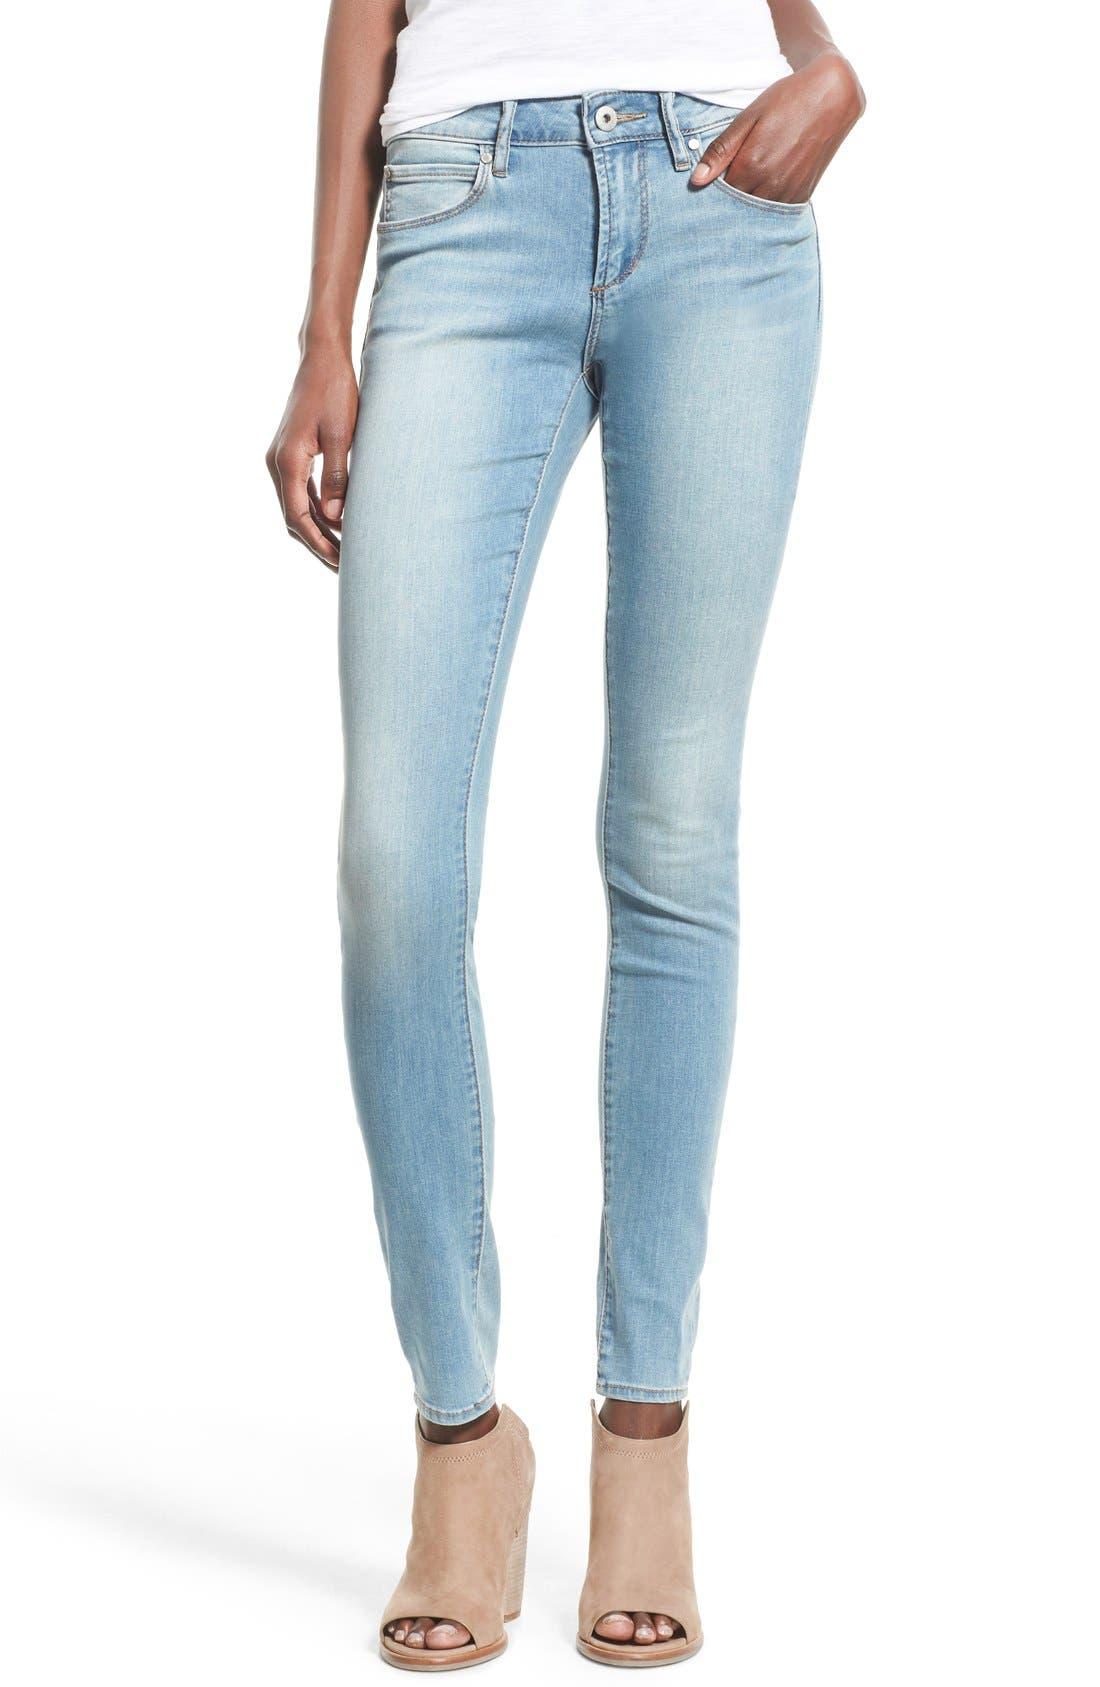 Alternate Image 1 Selected - Articles of Society 'Mya' Skinny Jeans (Indigo Wash)